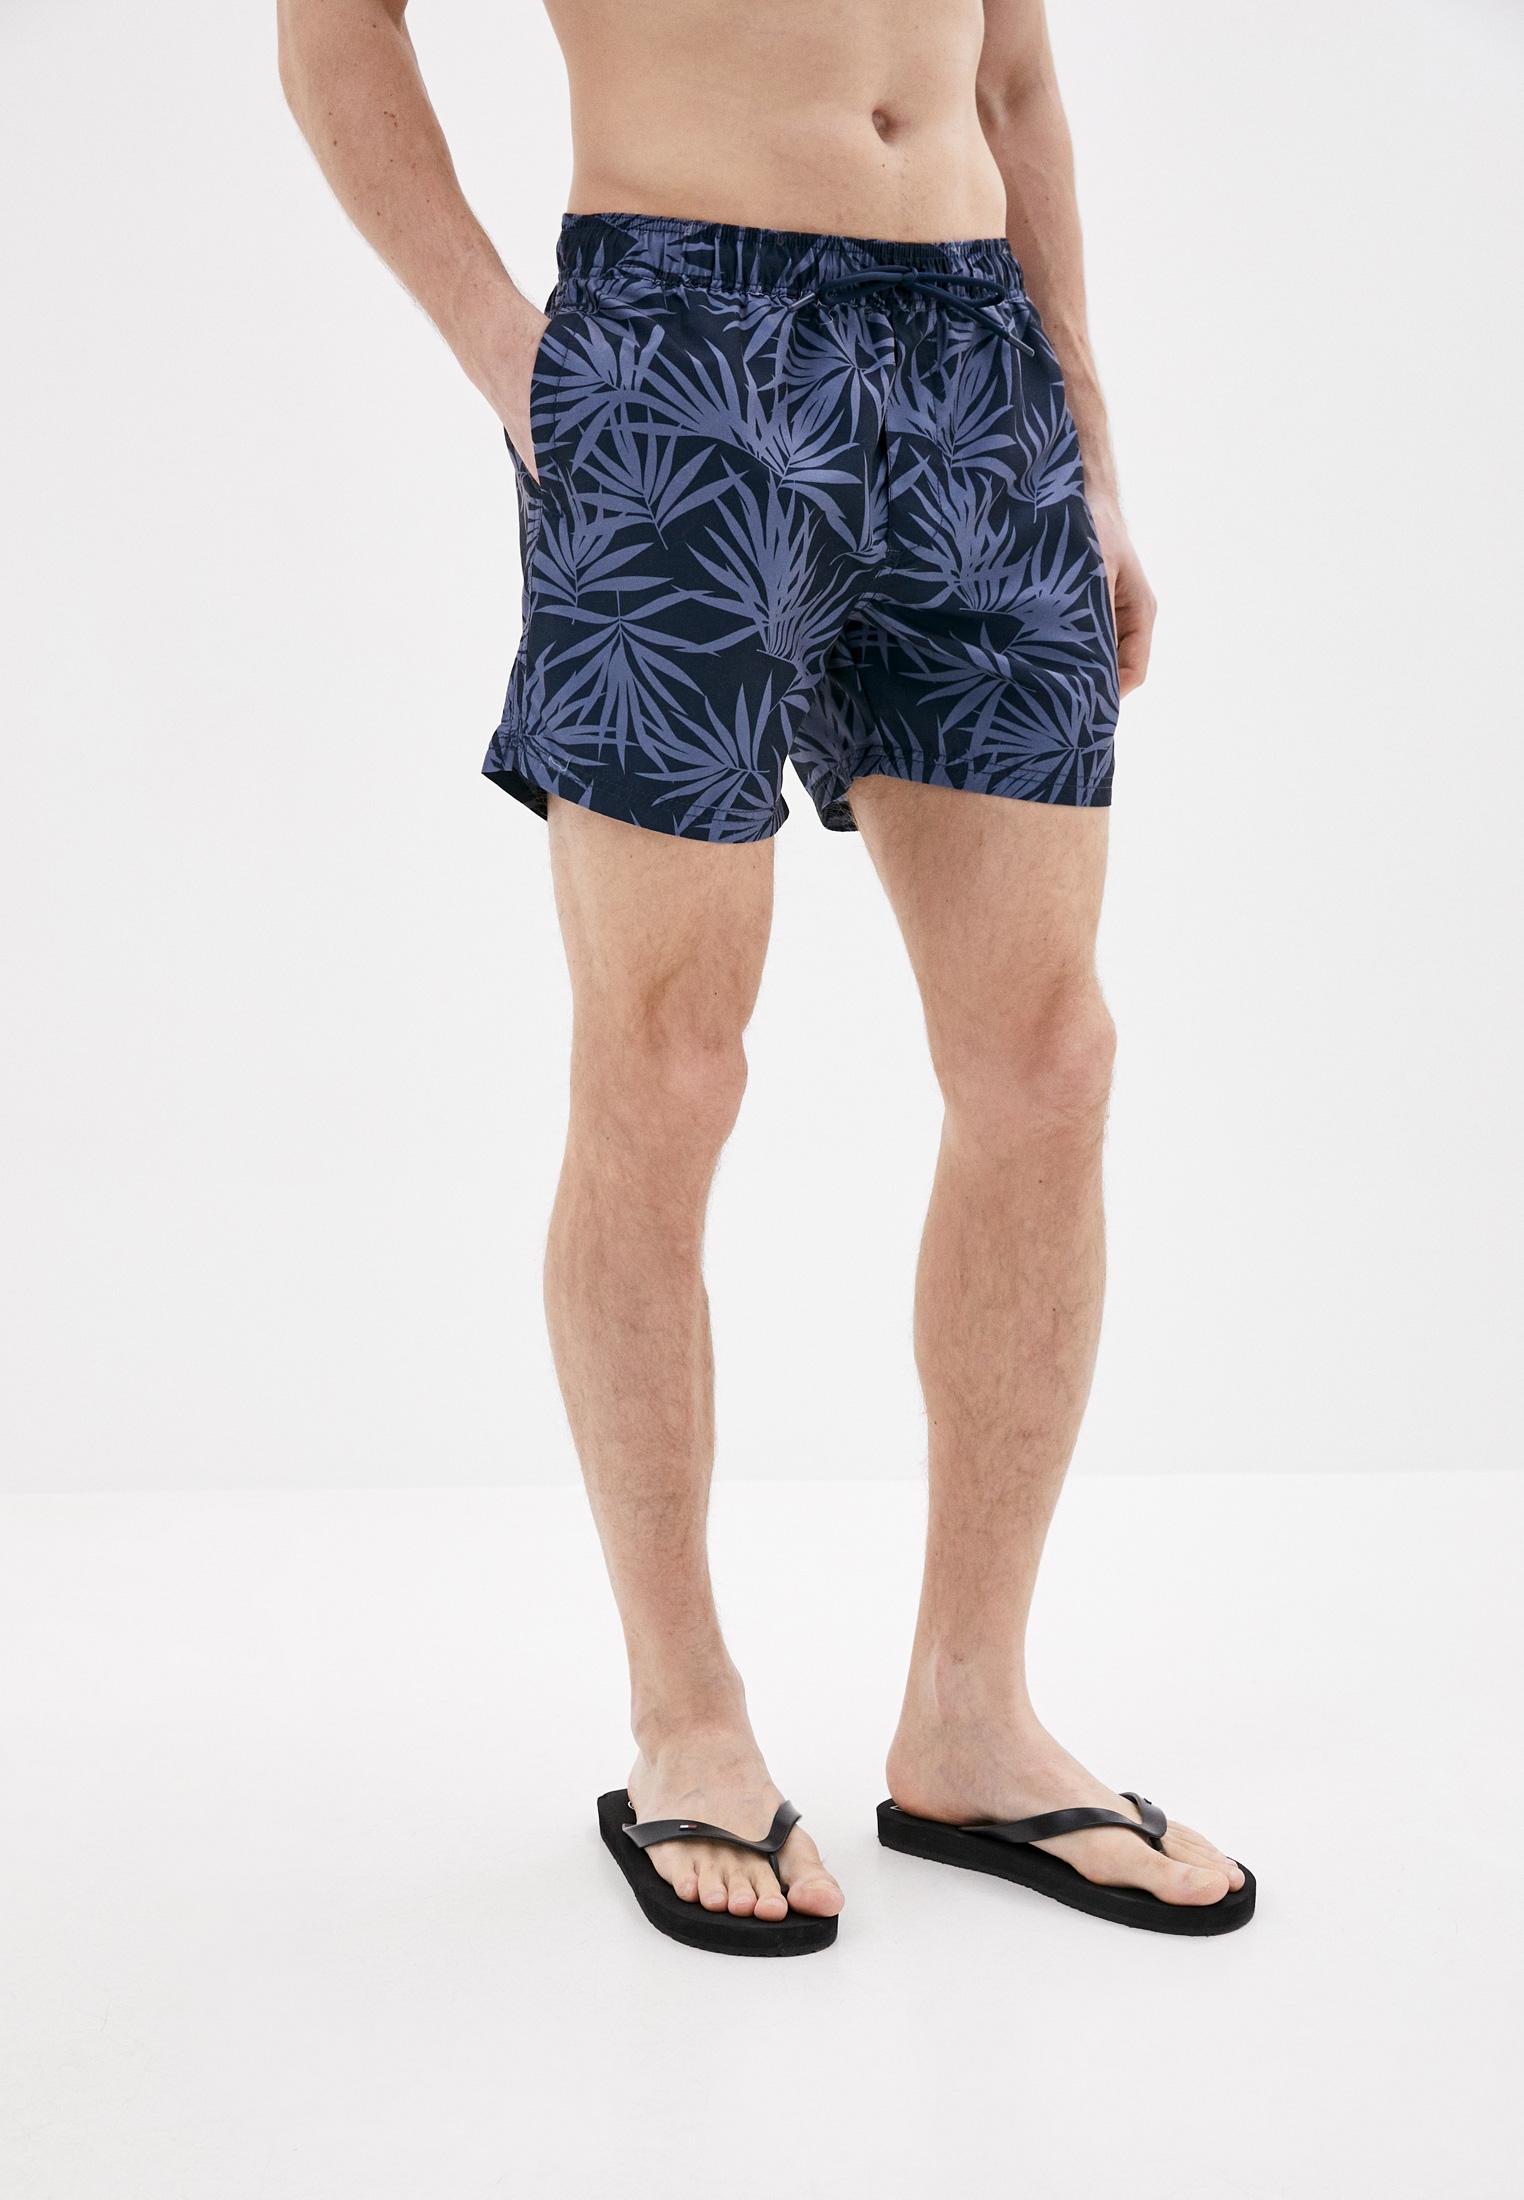 Мужские шорты для плавания Cotton On 351066-179